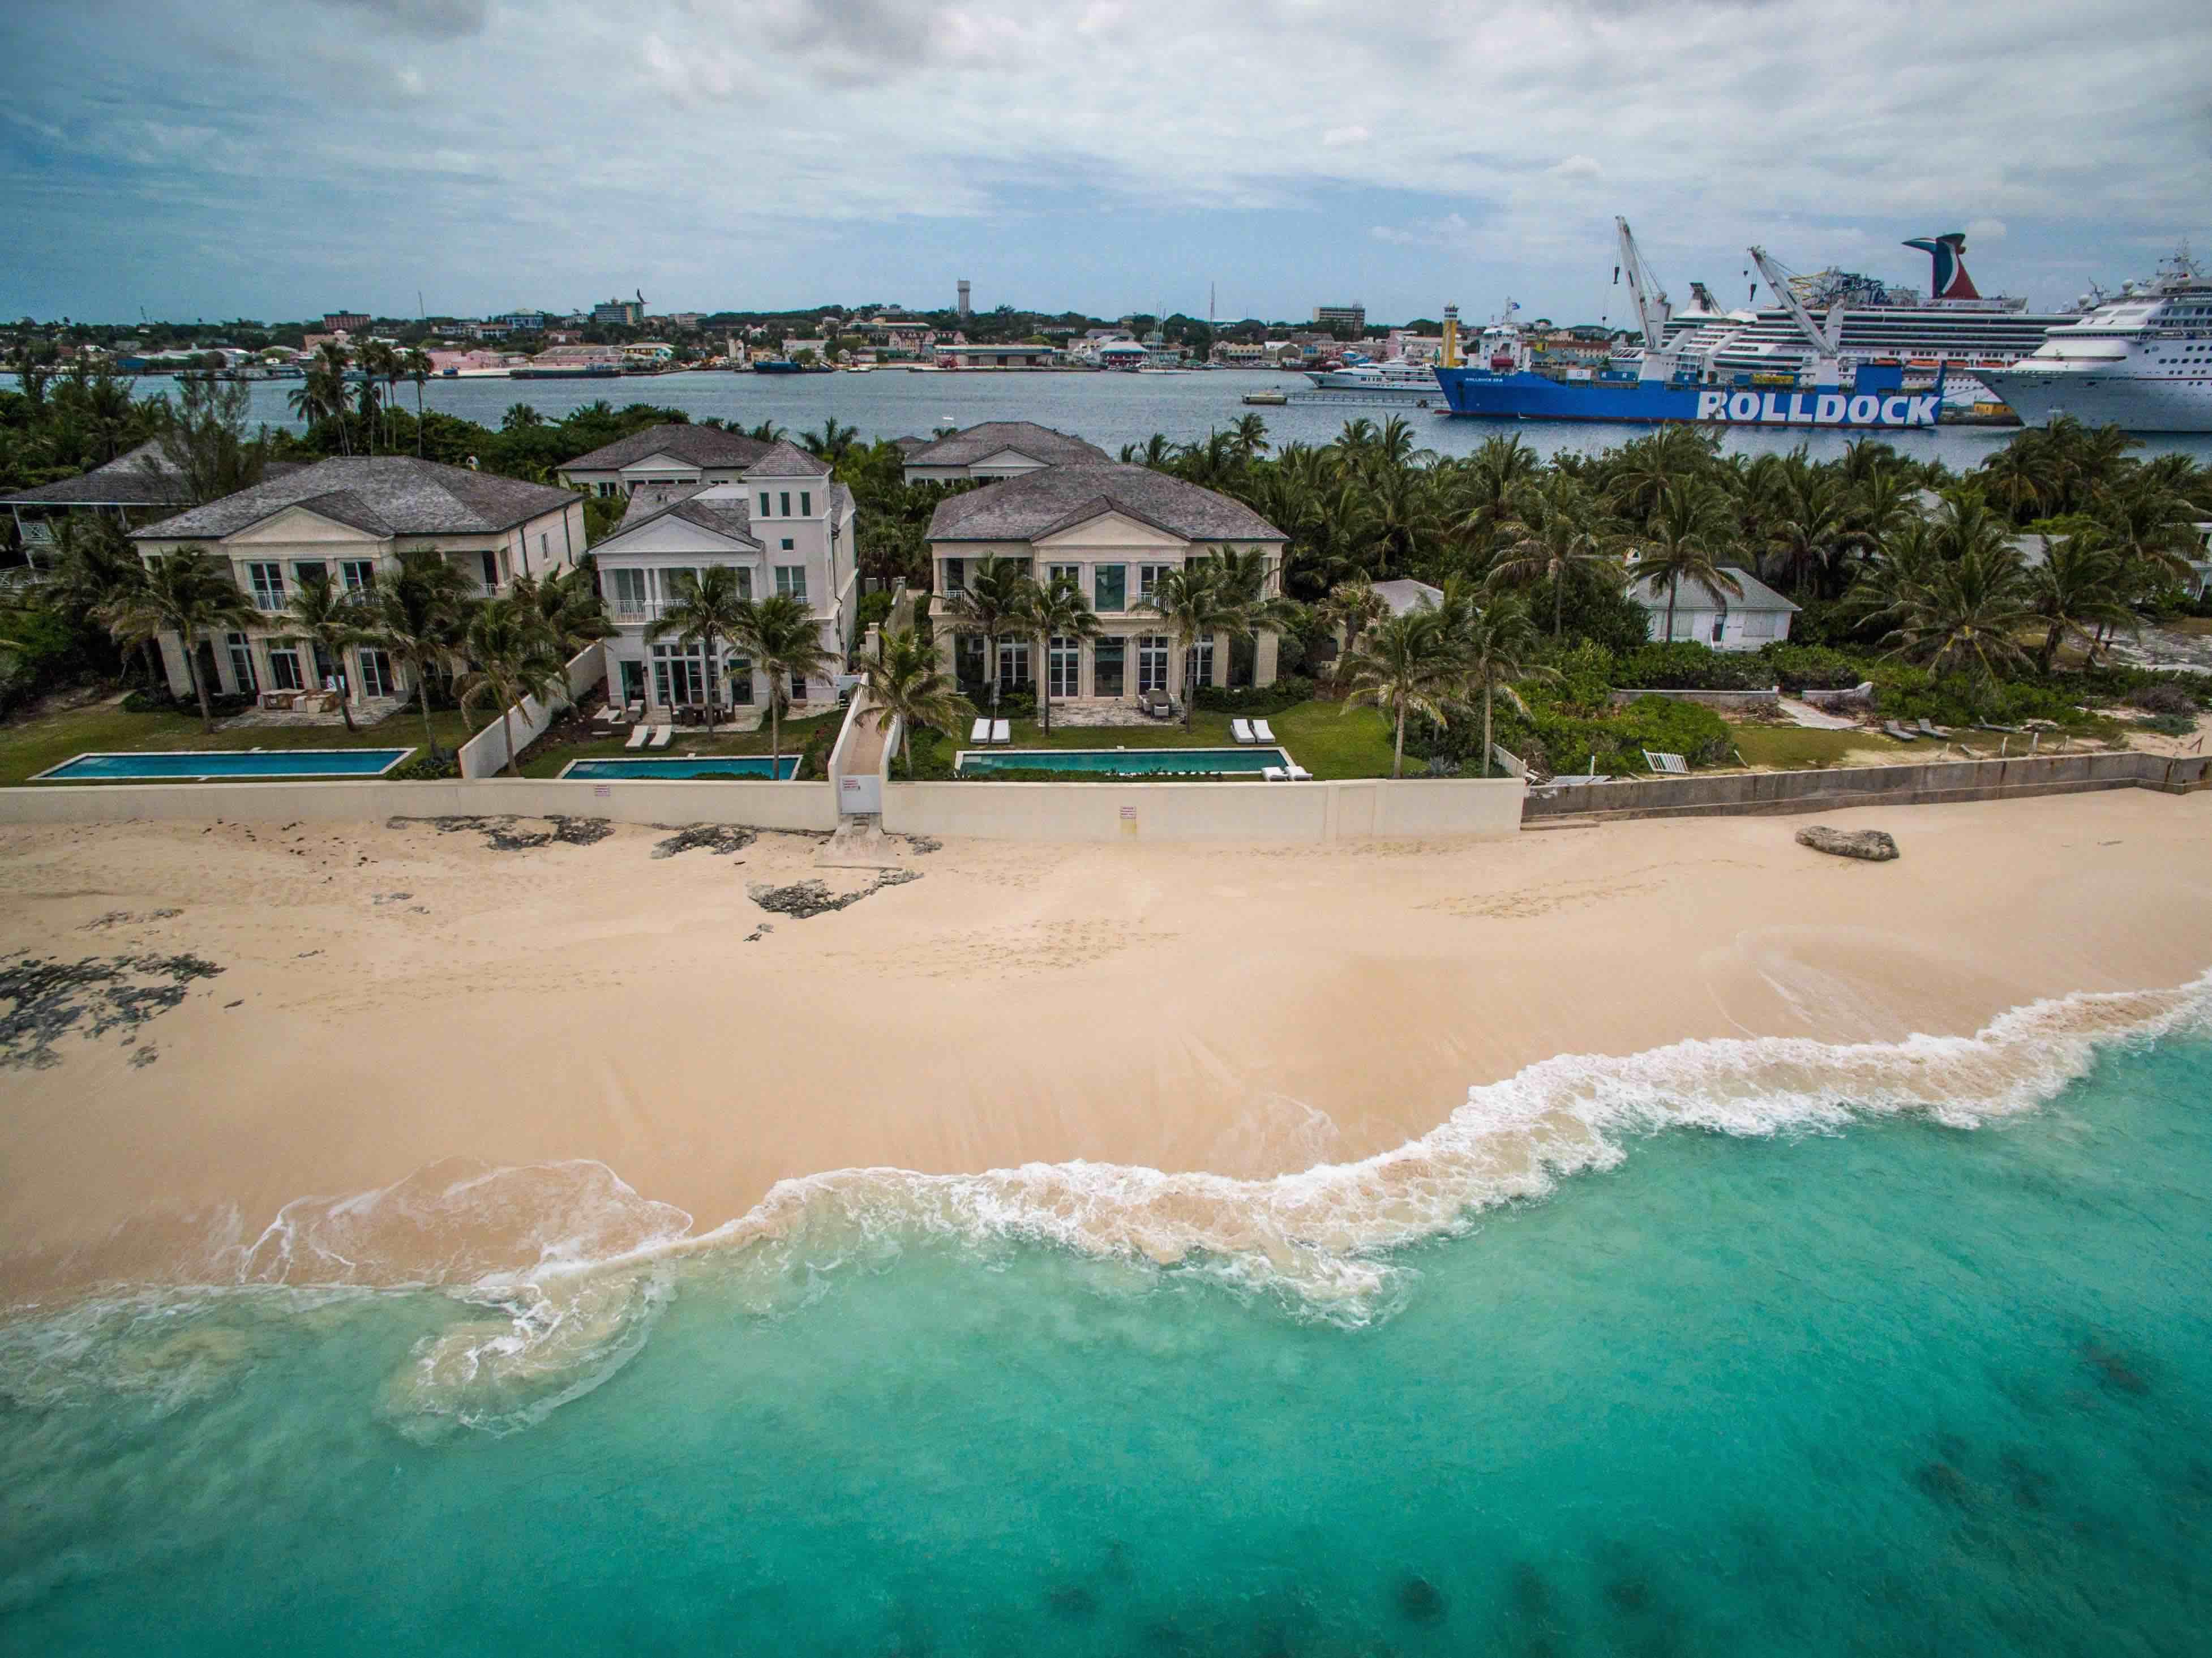 MMD Realty Presents Luxury Beach Villas in the Bahamas ...